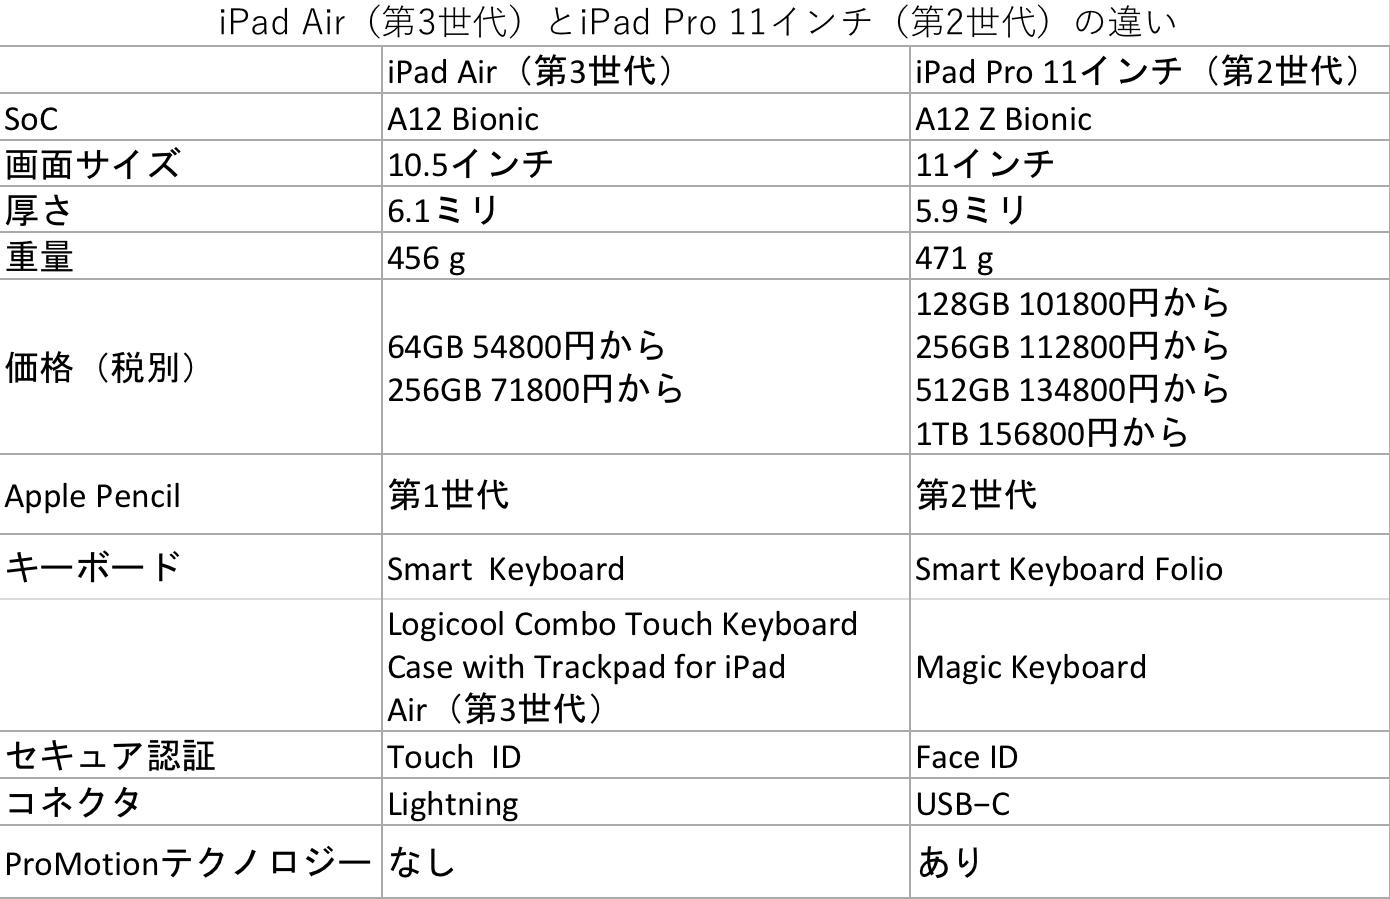 iPad Air(第3世代)とiPad Pro 11インチ(第2世代)の比較